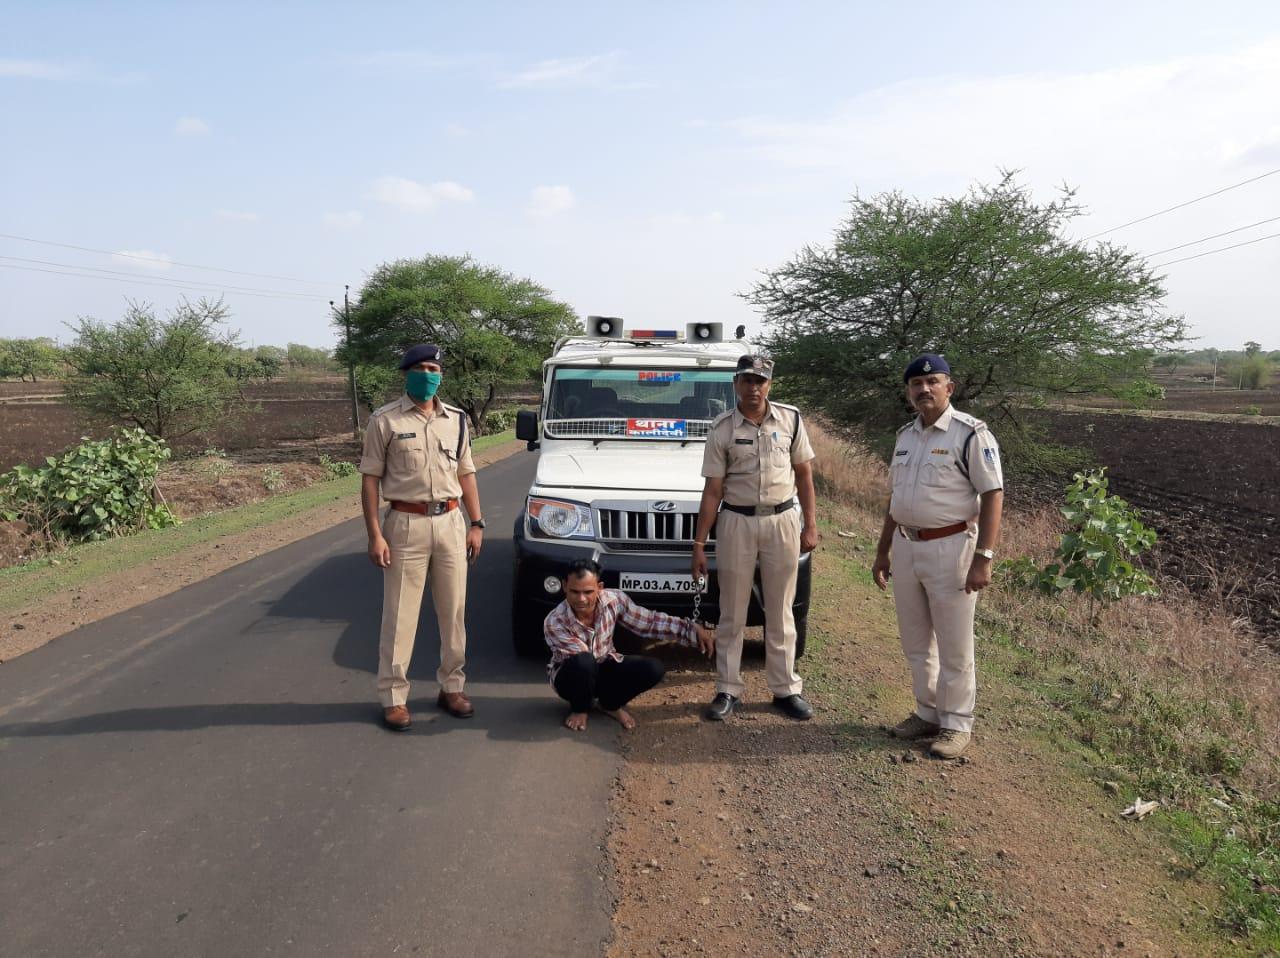 Jhabua News- अवैध शराब परिवहन करते आरोपी गिरफ्तार